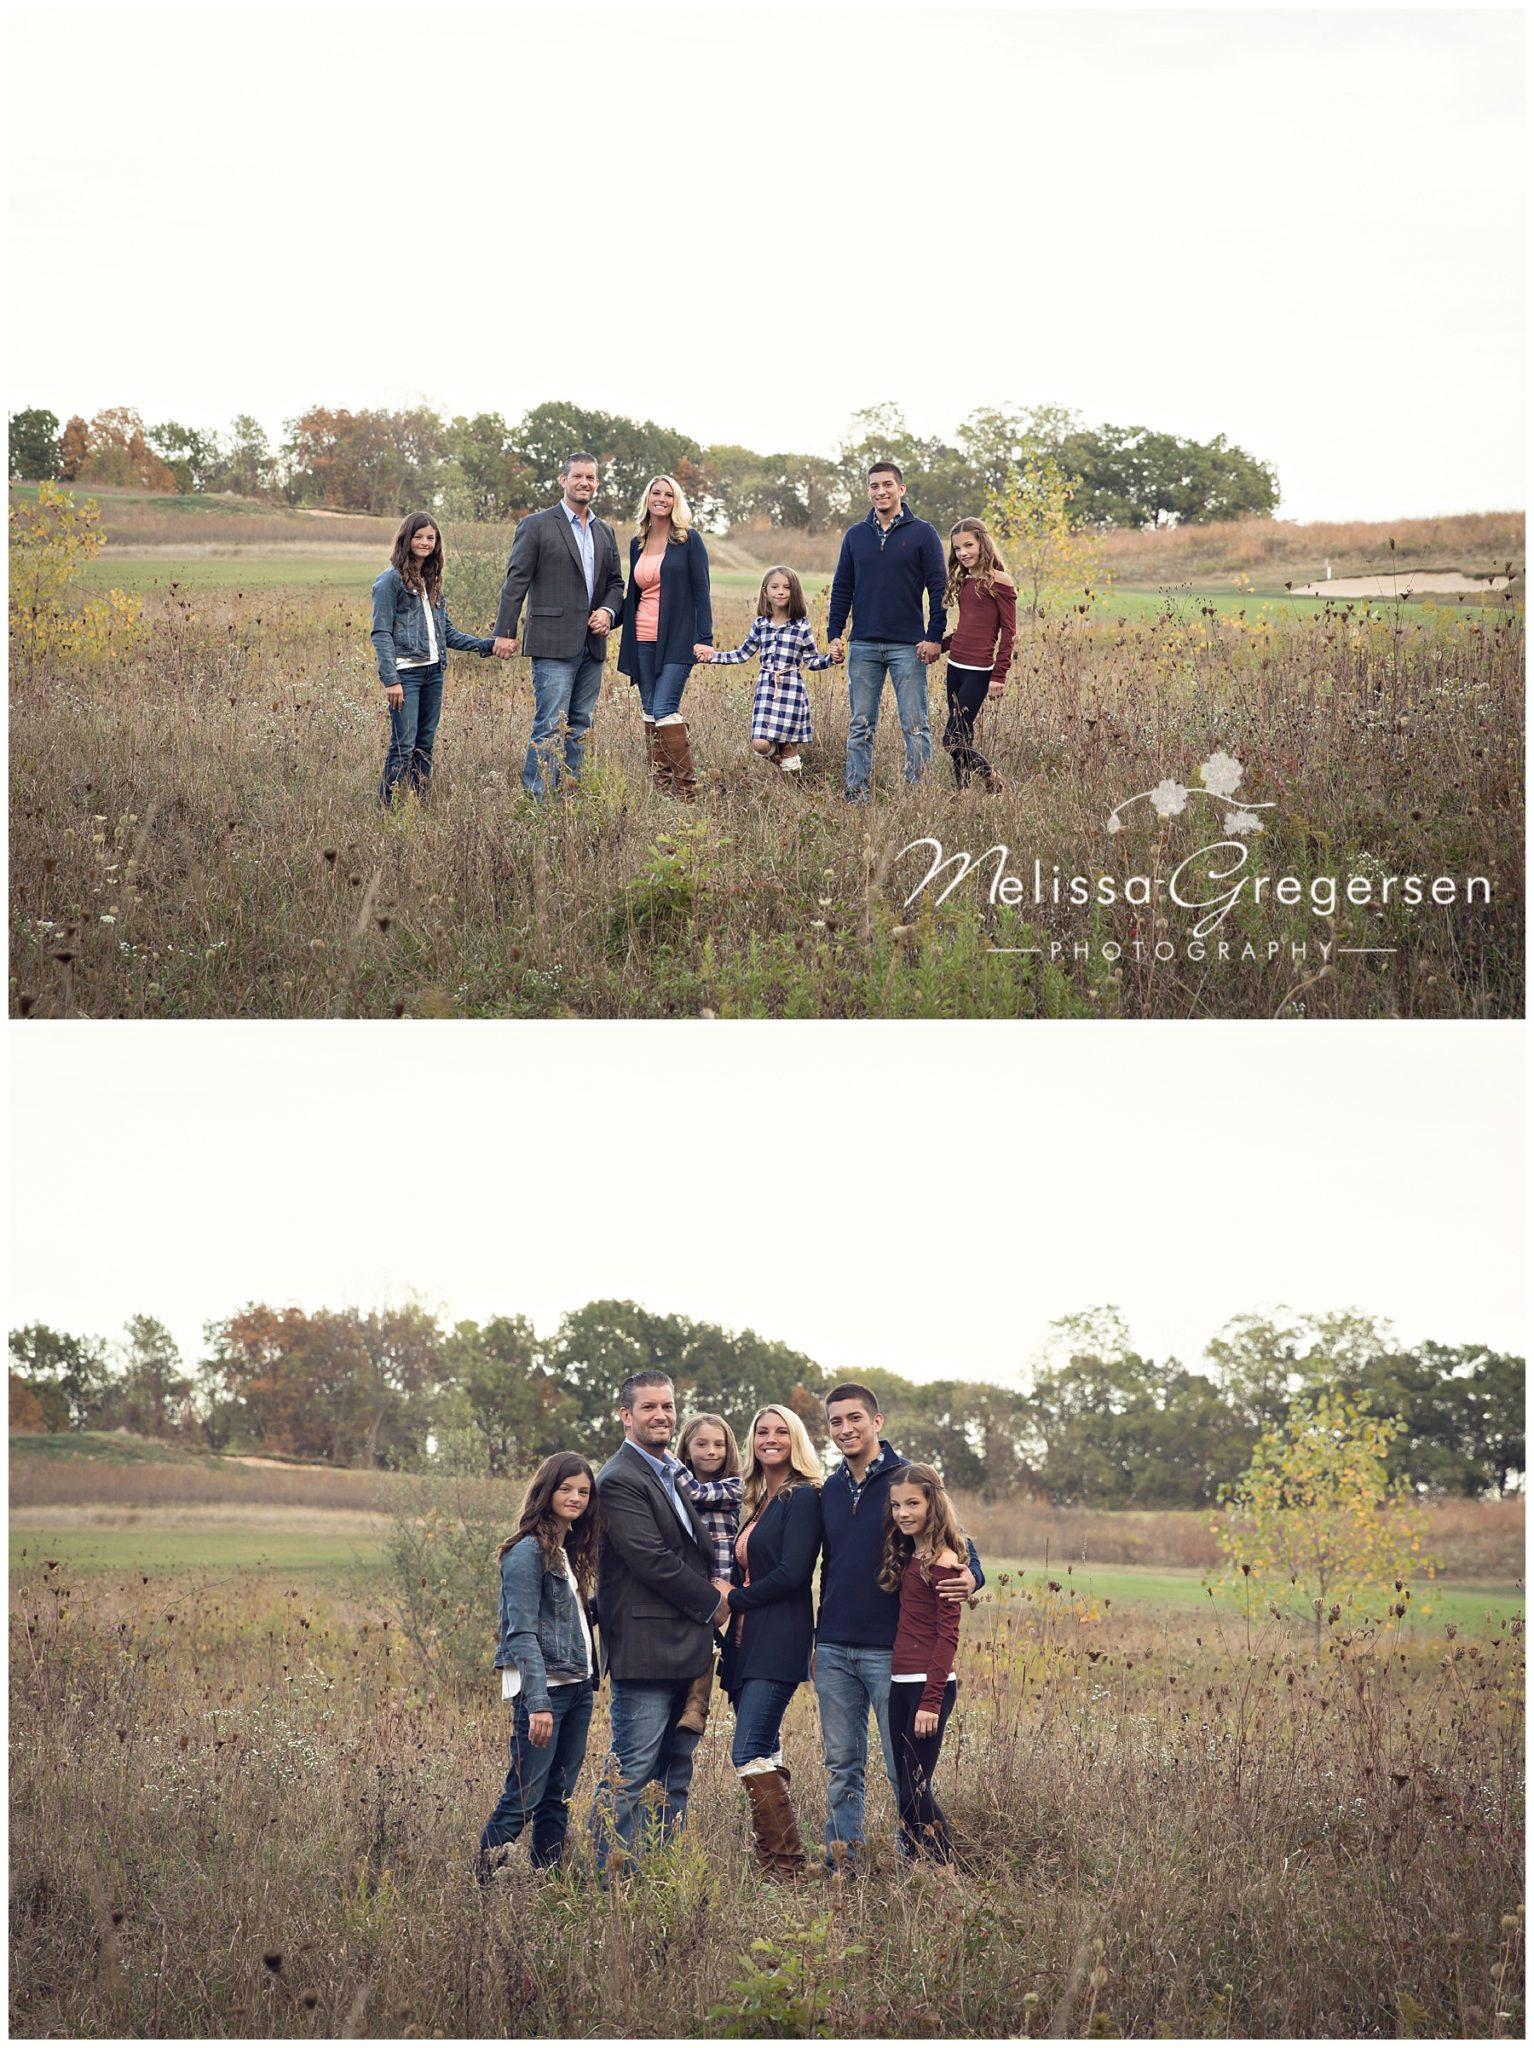 Cuvelier Family :: Kalamazoo Michigan Family Photography - Gregersen Photography